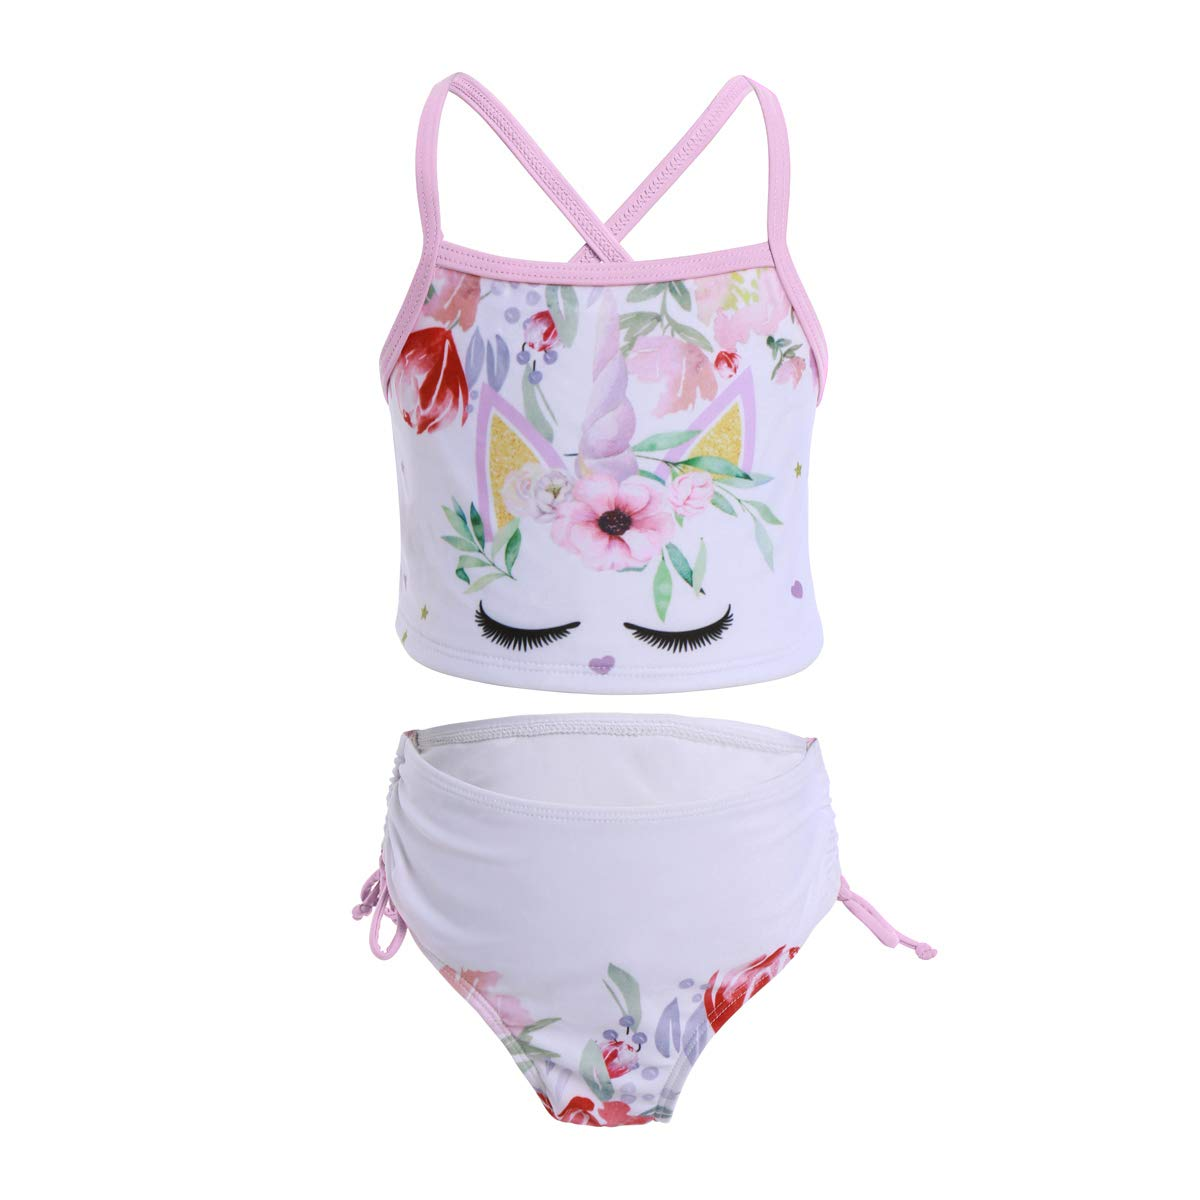 Kids Girls Cartoon Character Swimwear Swimming Costume Swimsuit Bikini  Tankini